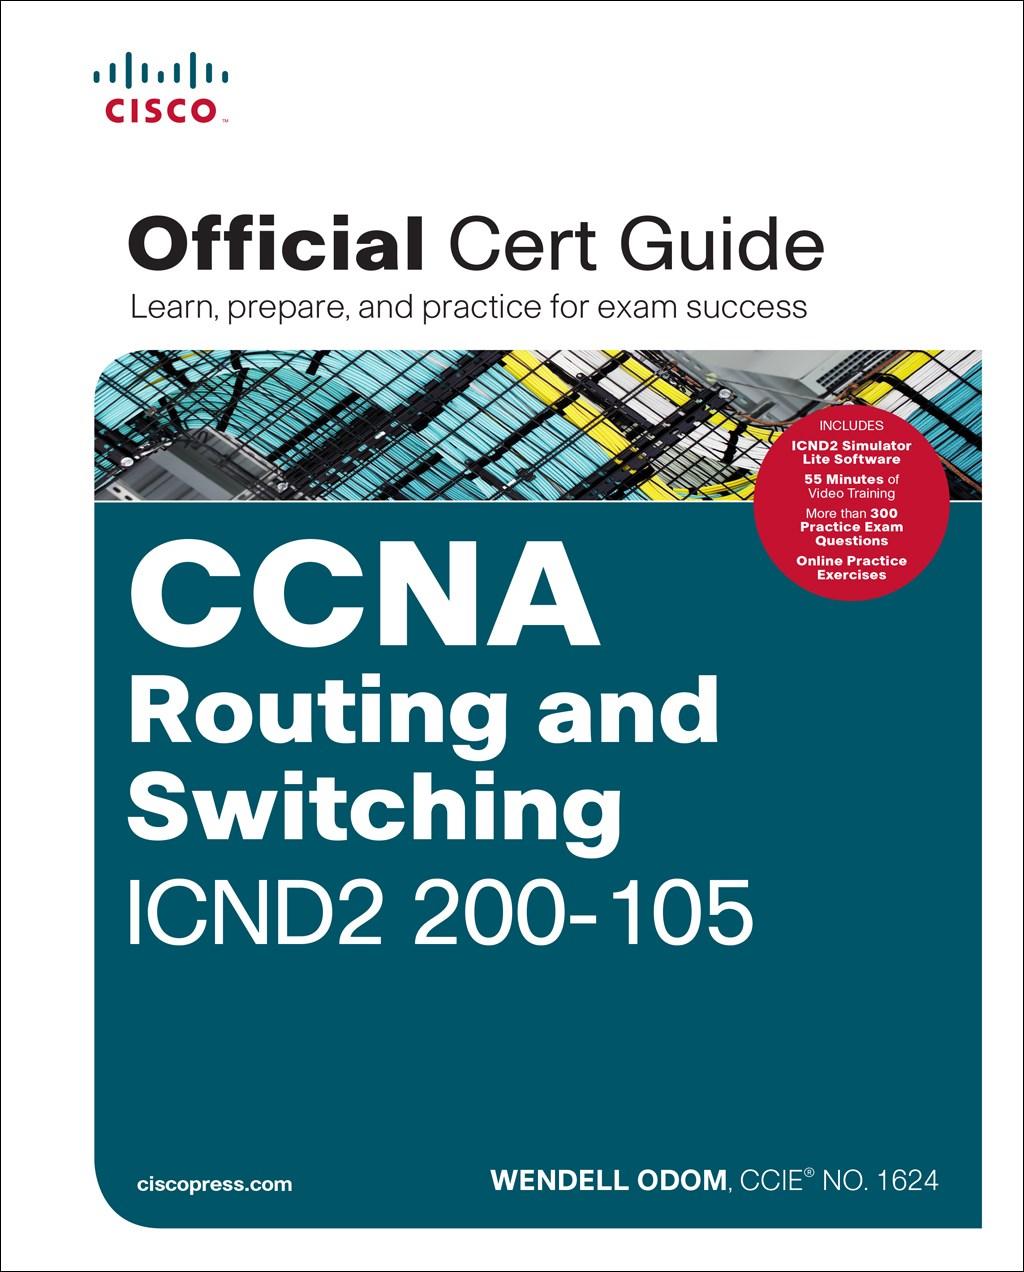 sybex ccna 200 125 pdf free download